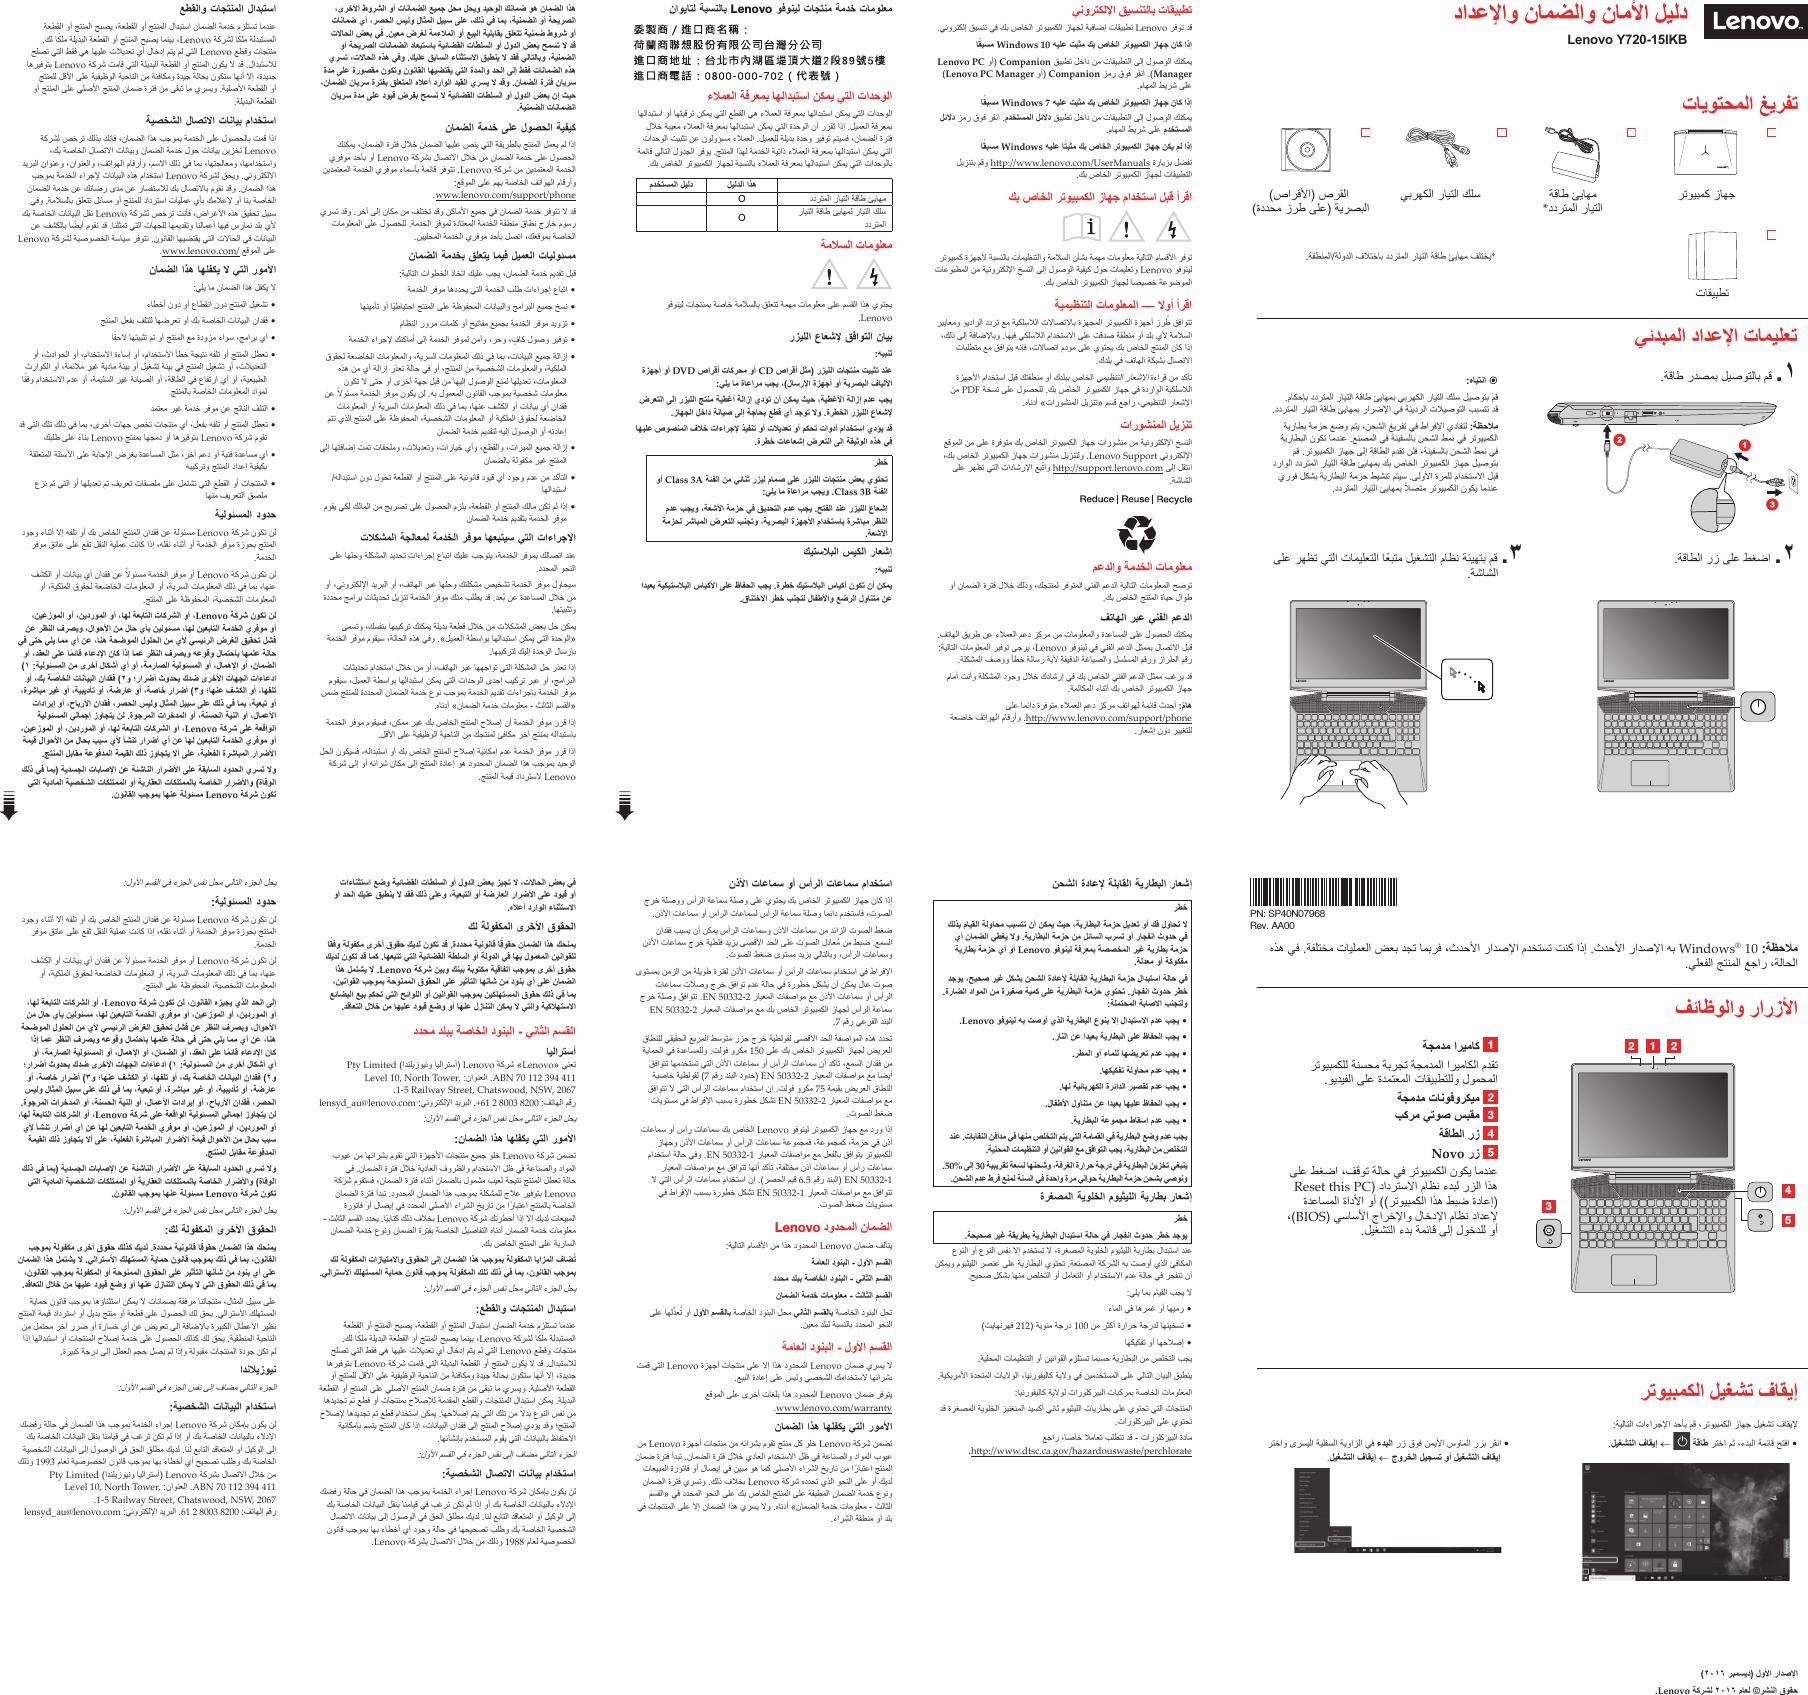 lenovo legion y720 manual pdf